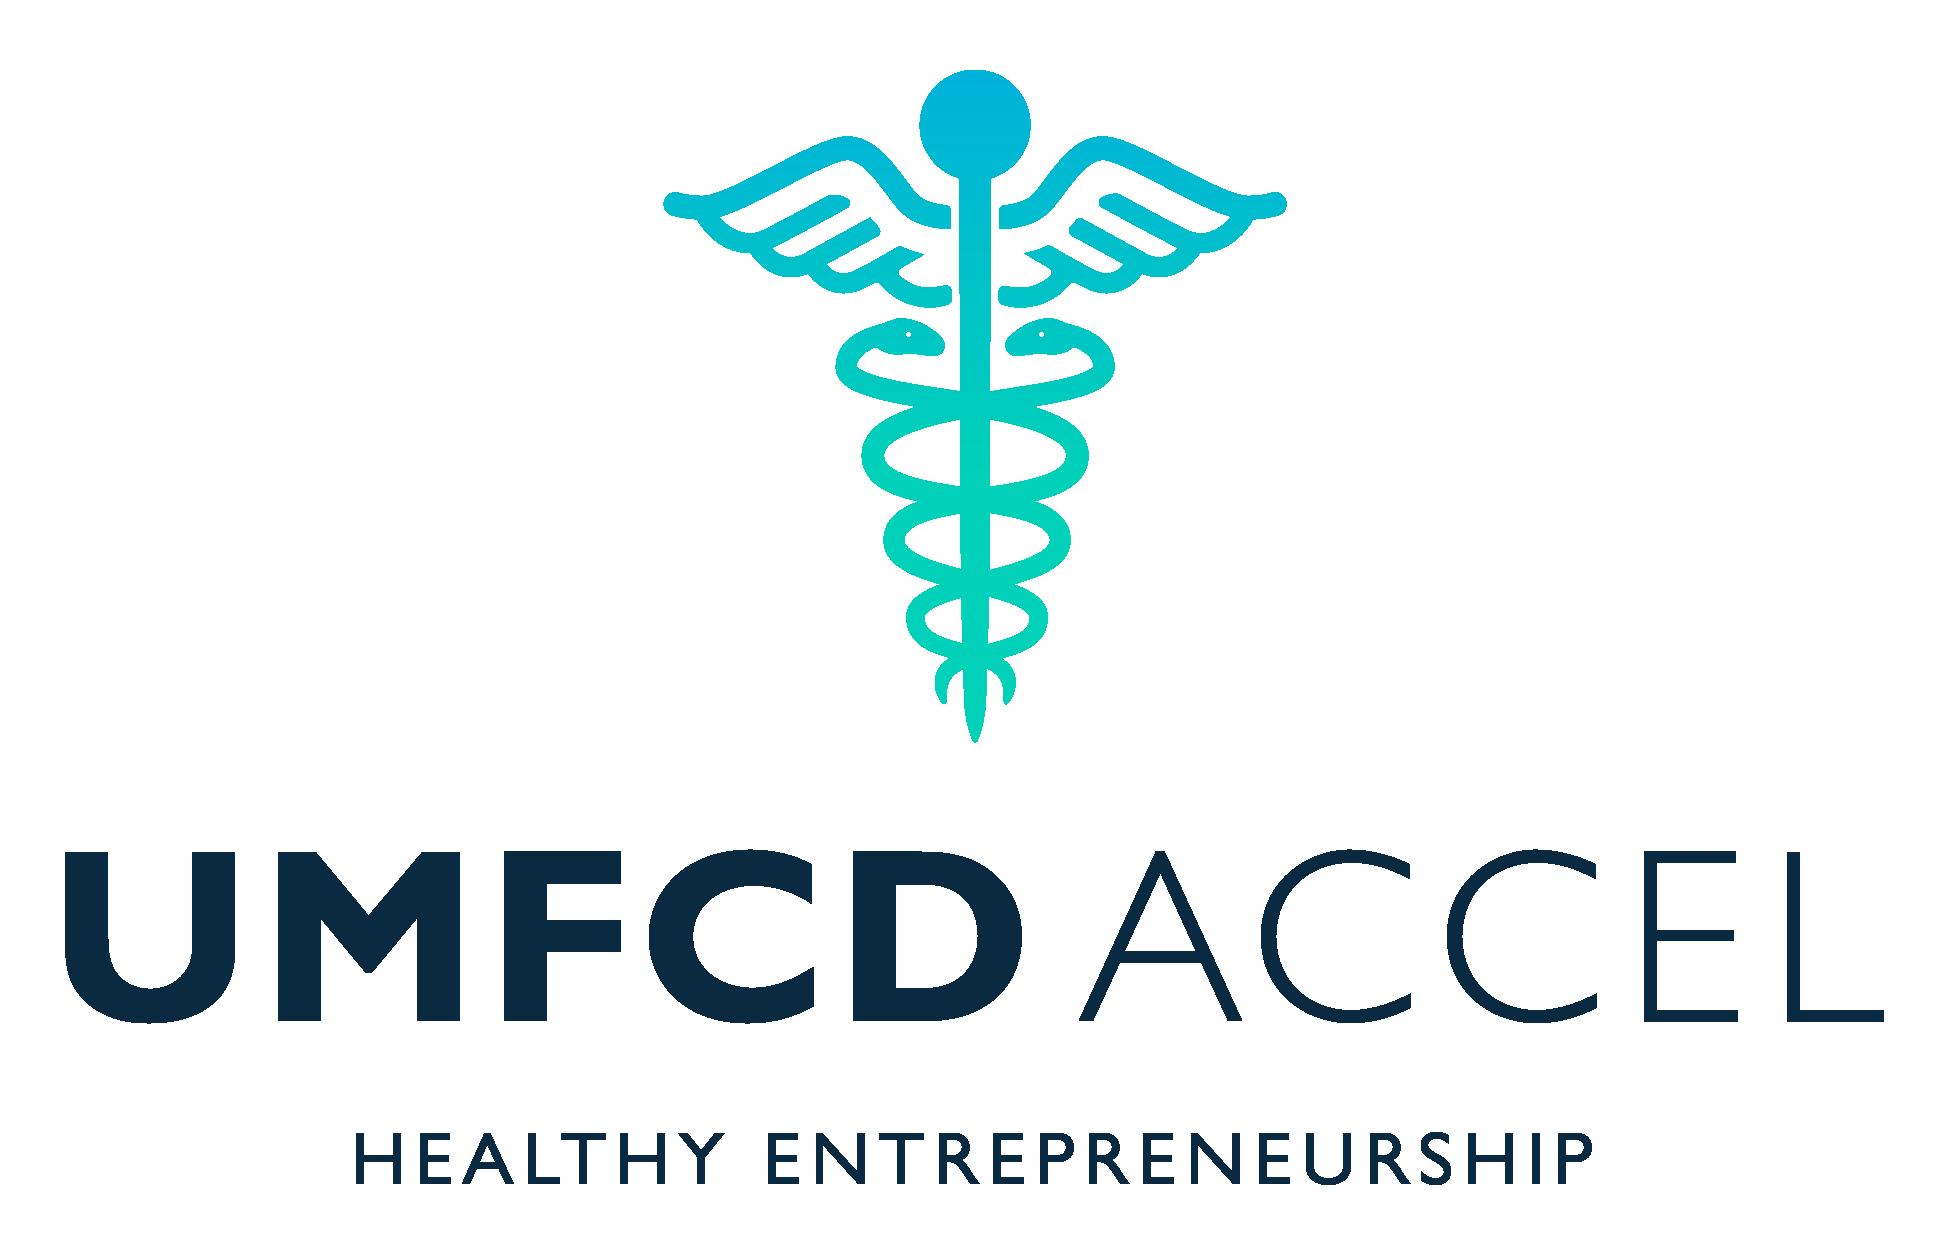 UMFCD Accel